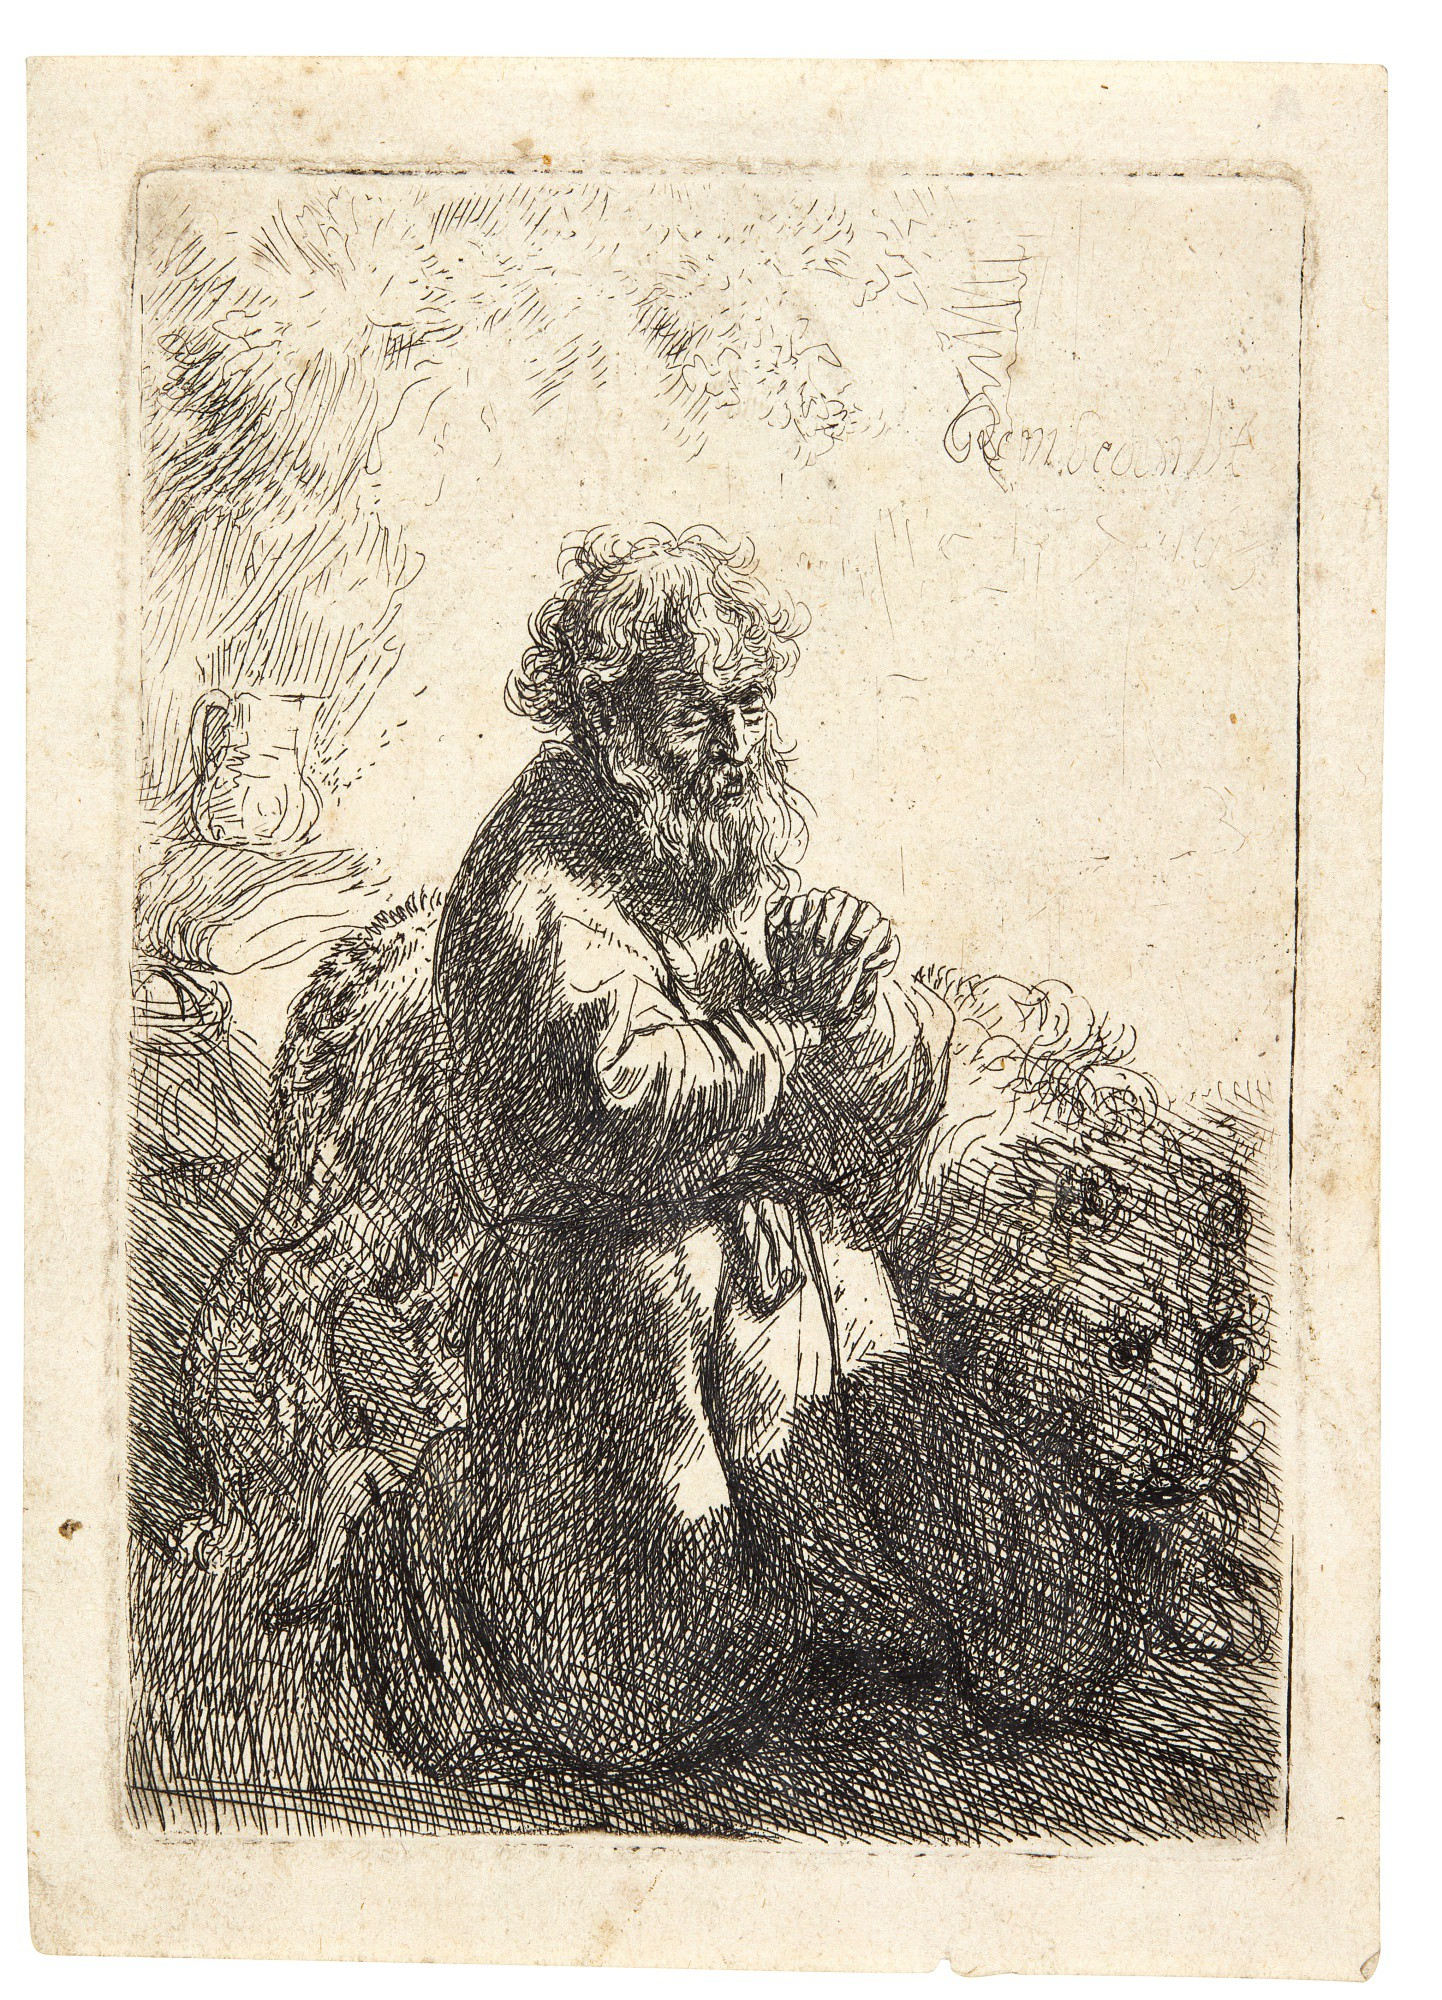 REMBRANDT HARMENSZ. VAN RIJN | ST JEROME KNEELING IN PRAYER, LOOKING DOWN (B., HOLL. 102; NEW HOLL. 142; H. 140)